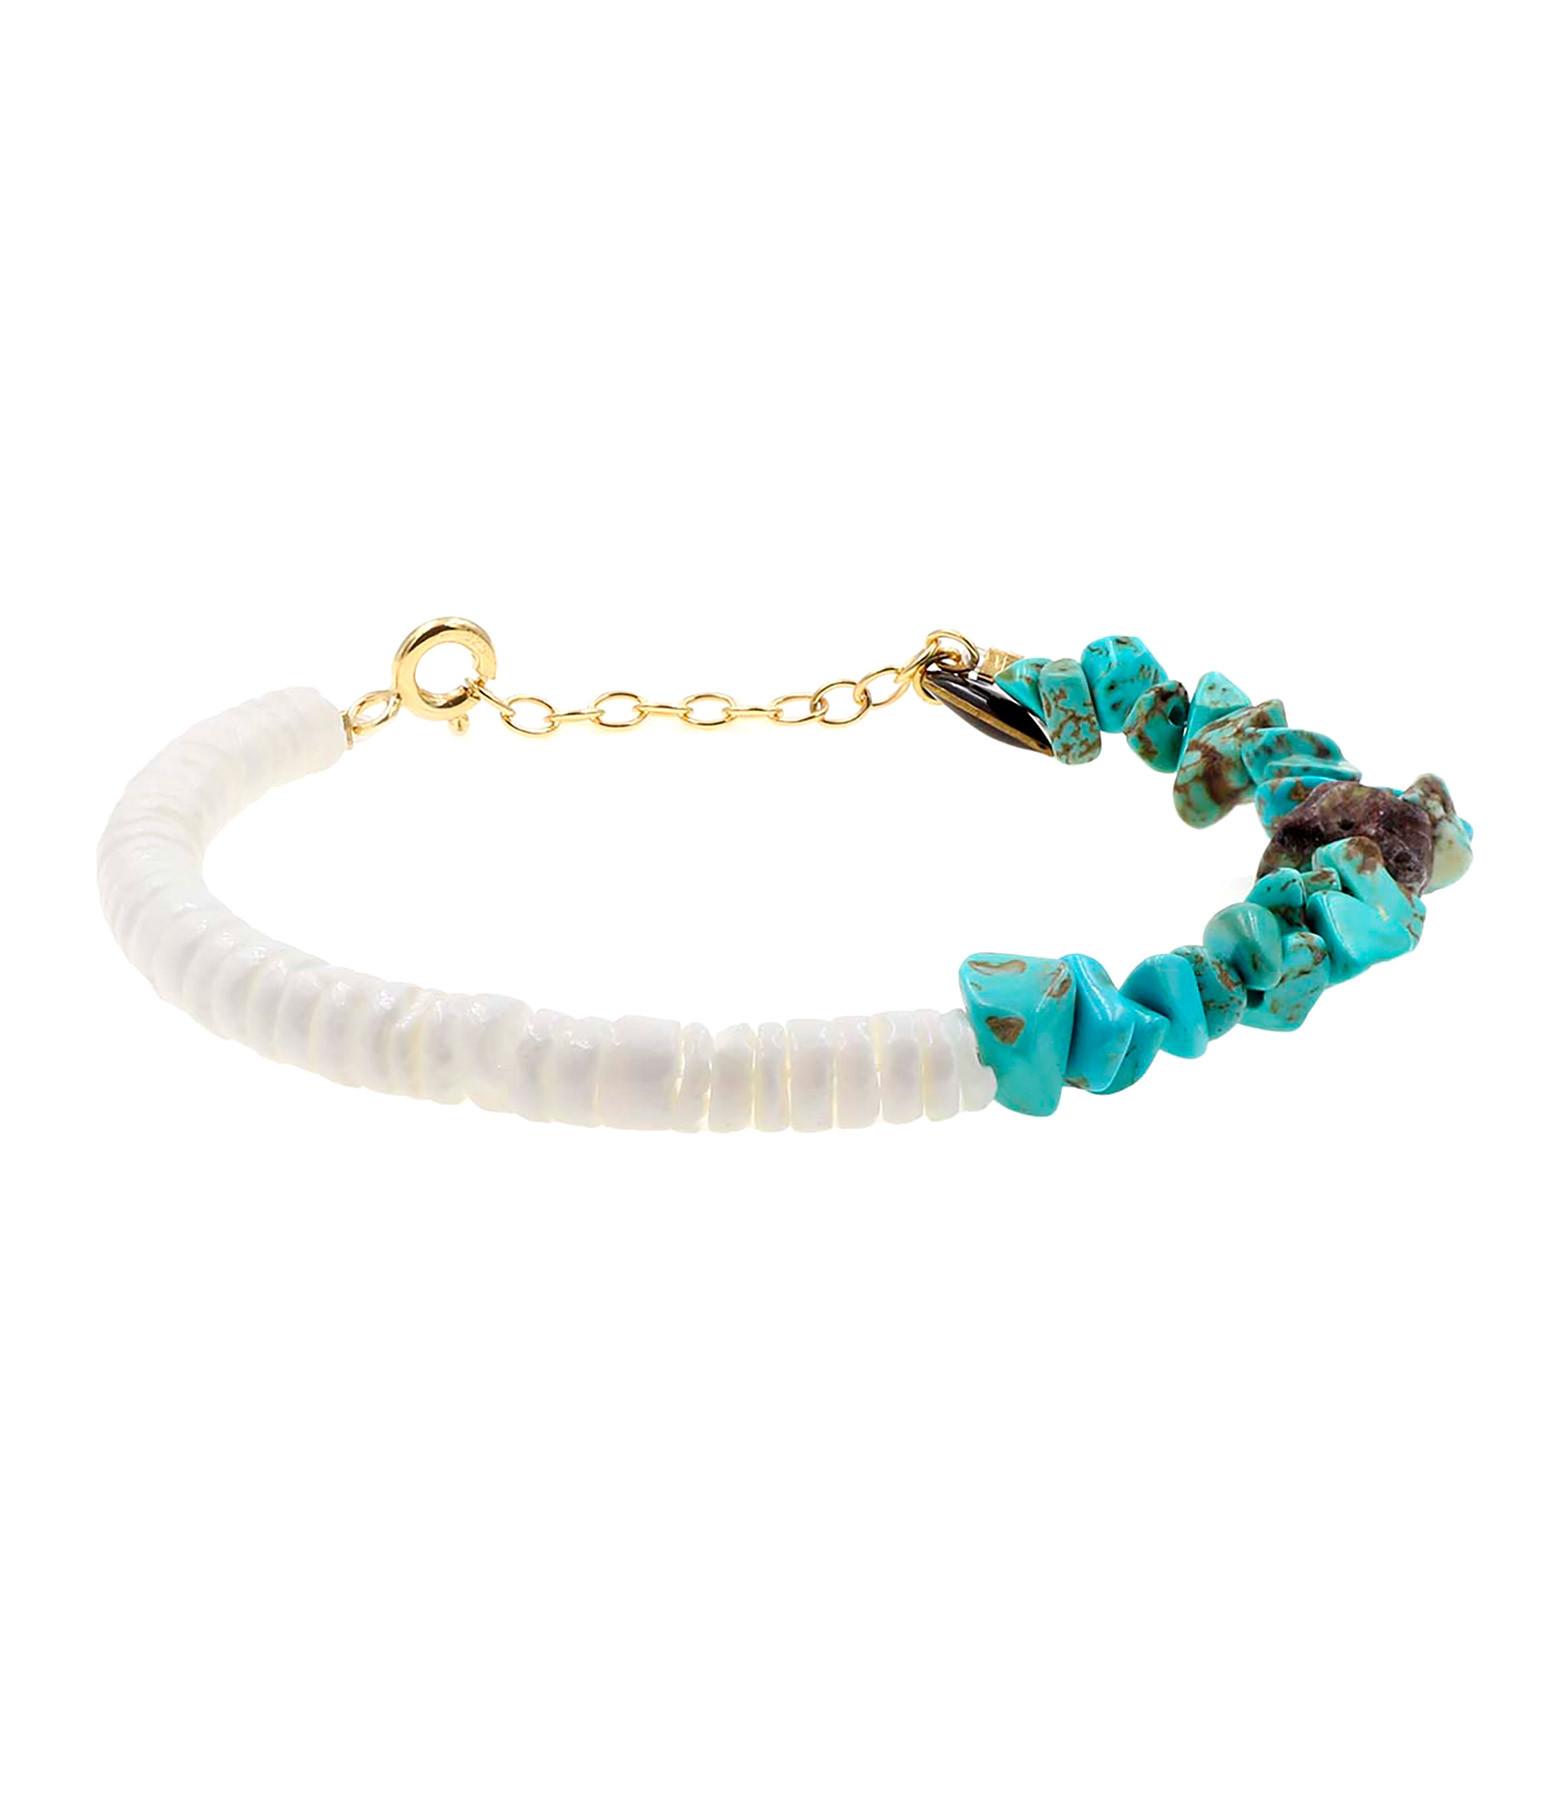 MON PRECIEUX GEM - Bracelet Bigoût Coquillage Turquoise